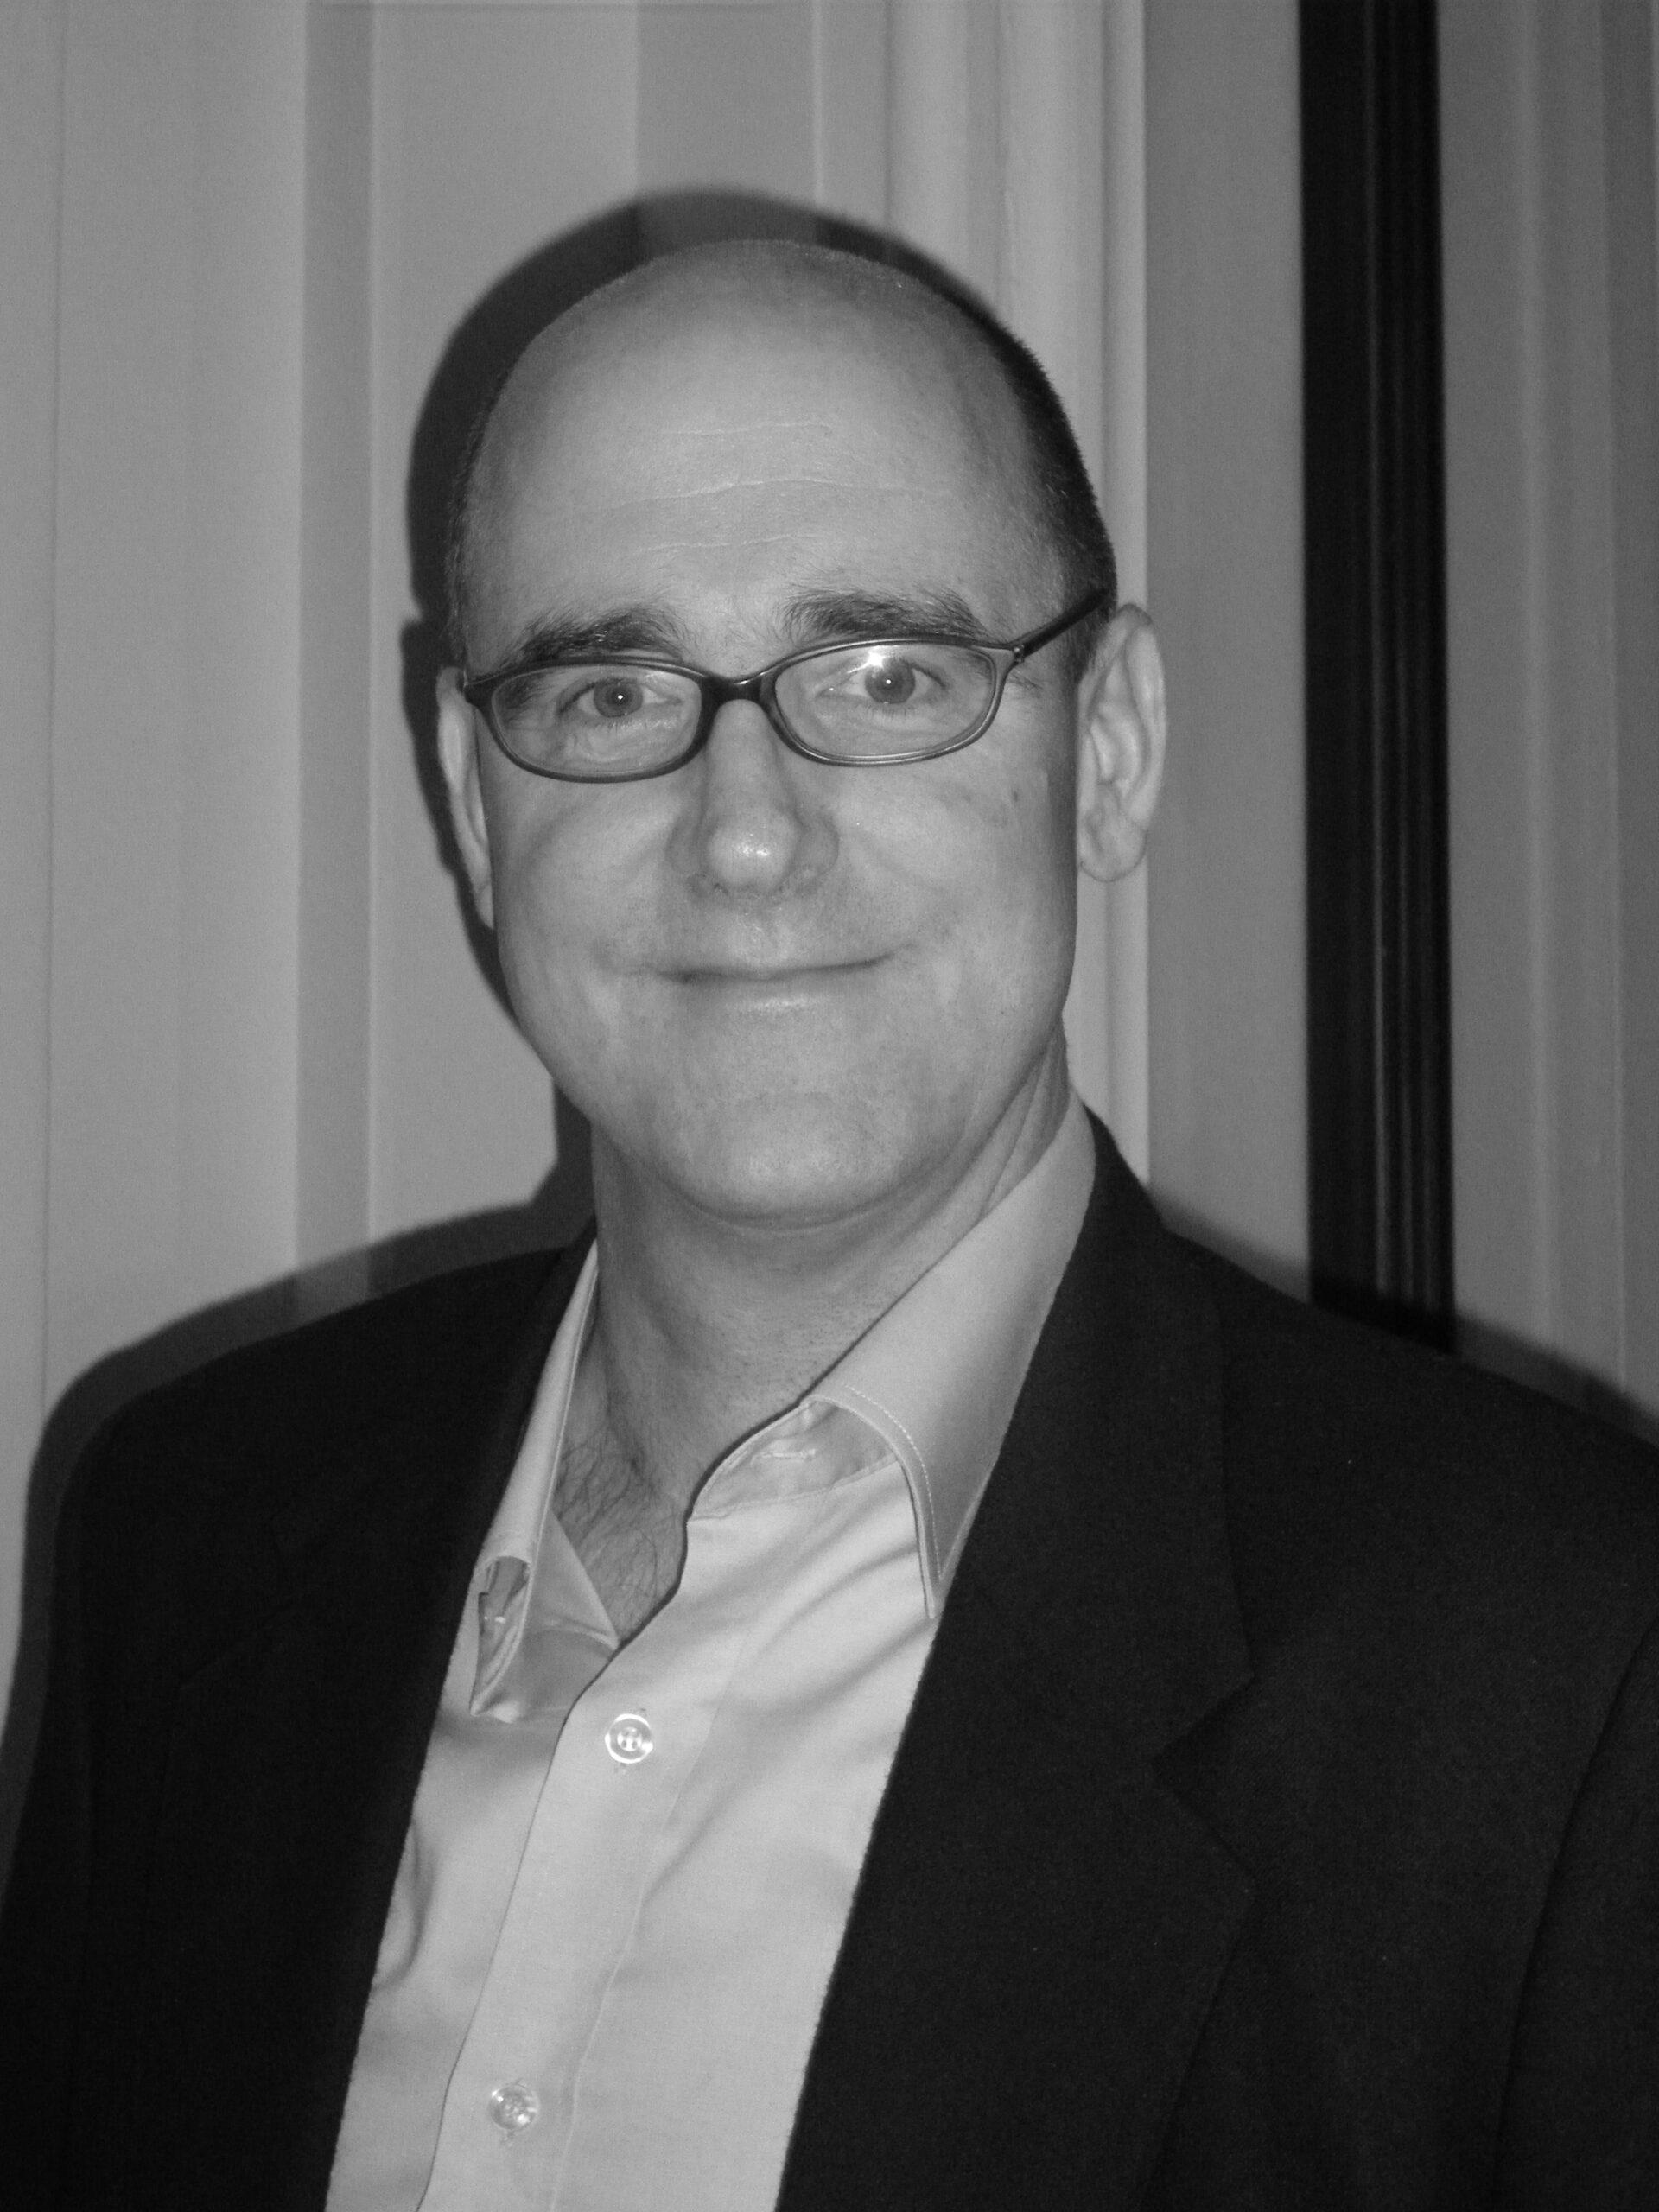 Duncan Ashworth